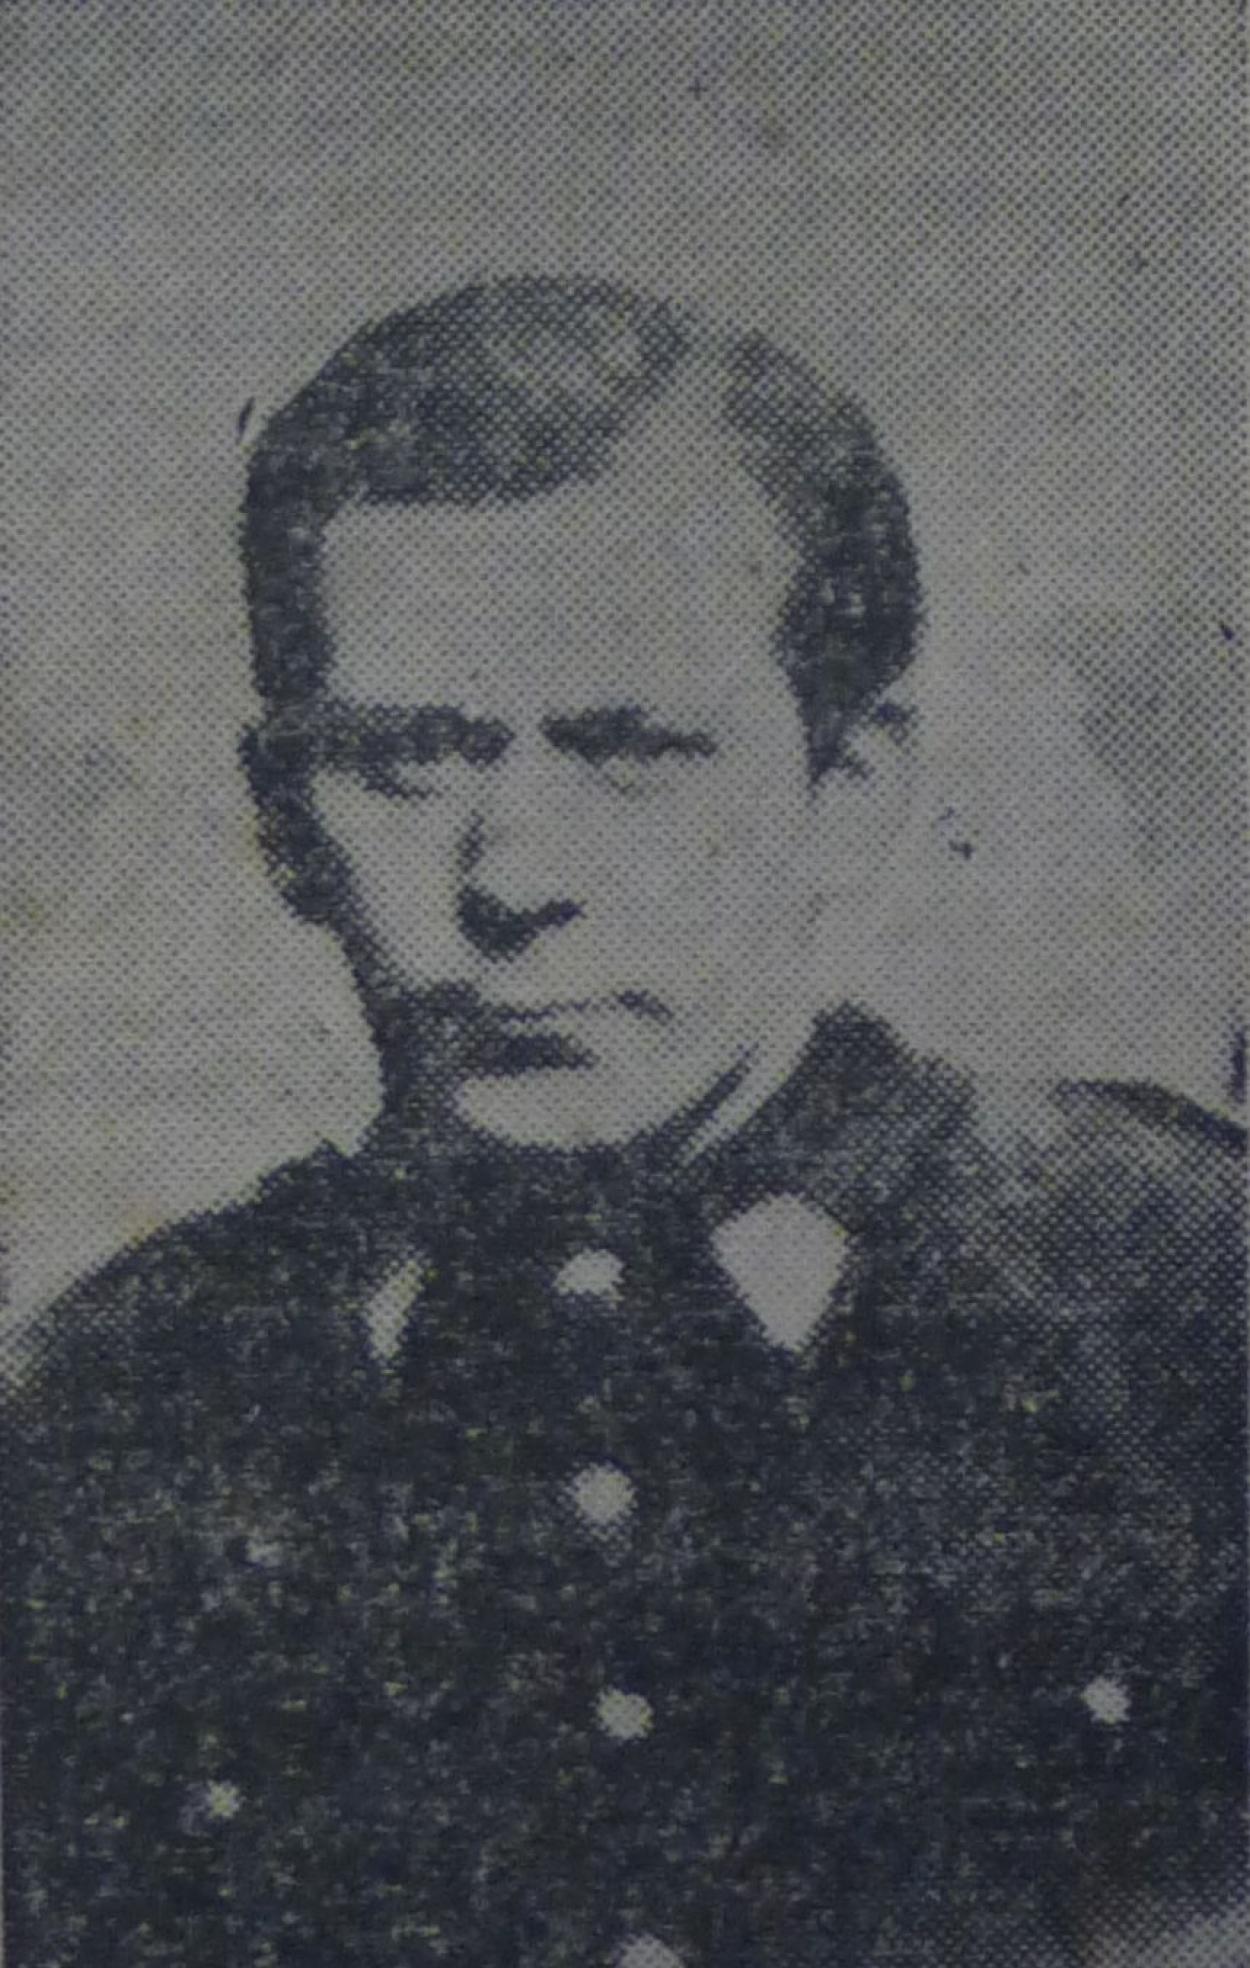 Predom_Drapeau Rouge 28 oktober 1944 Predom uitgesneden